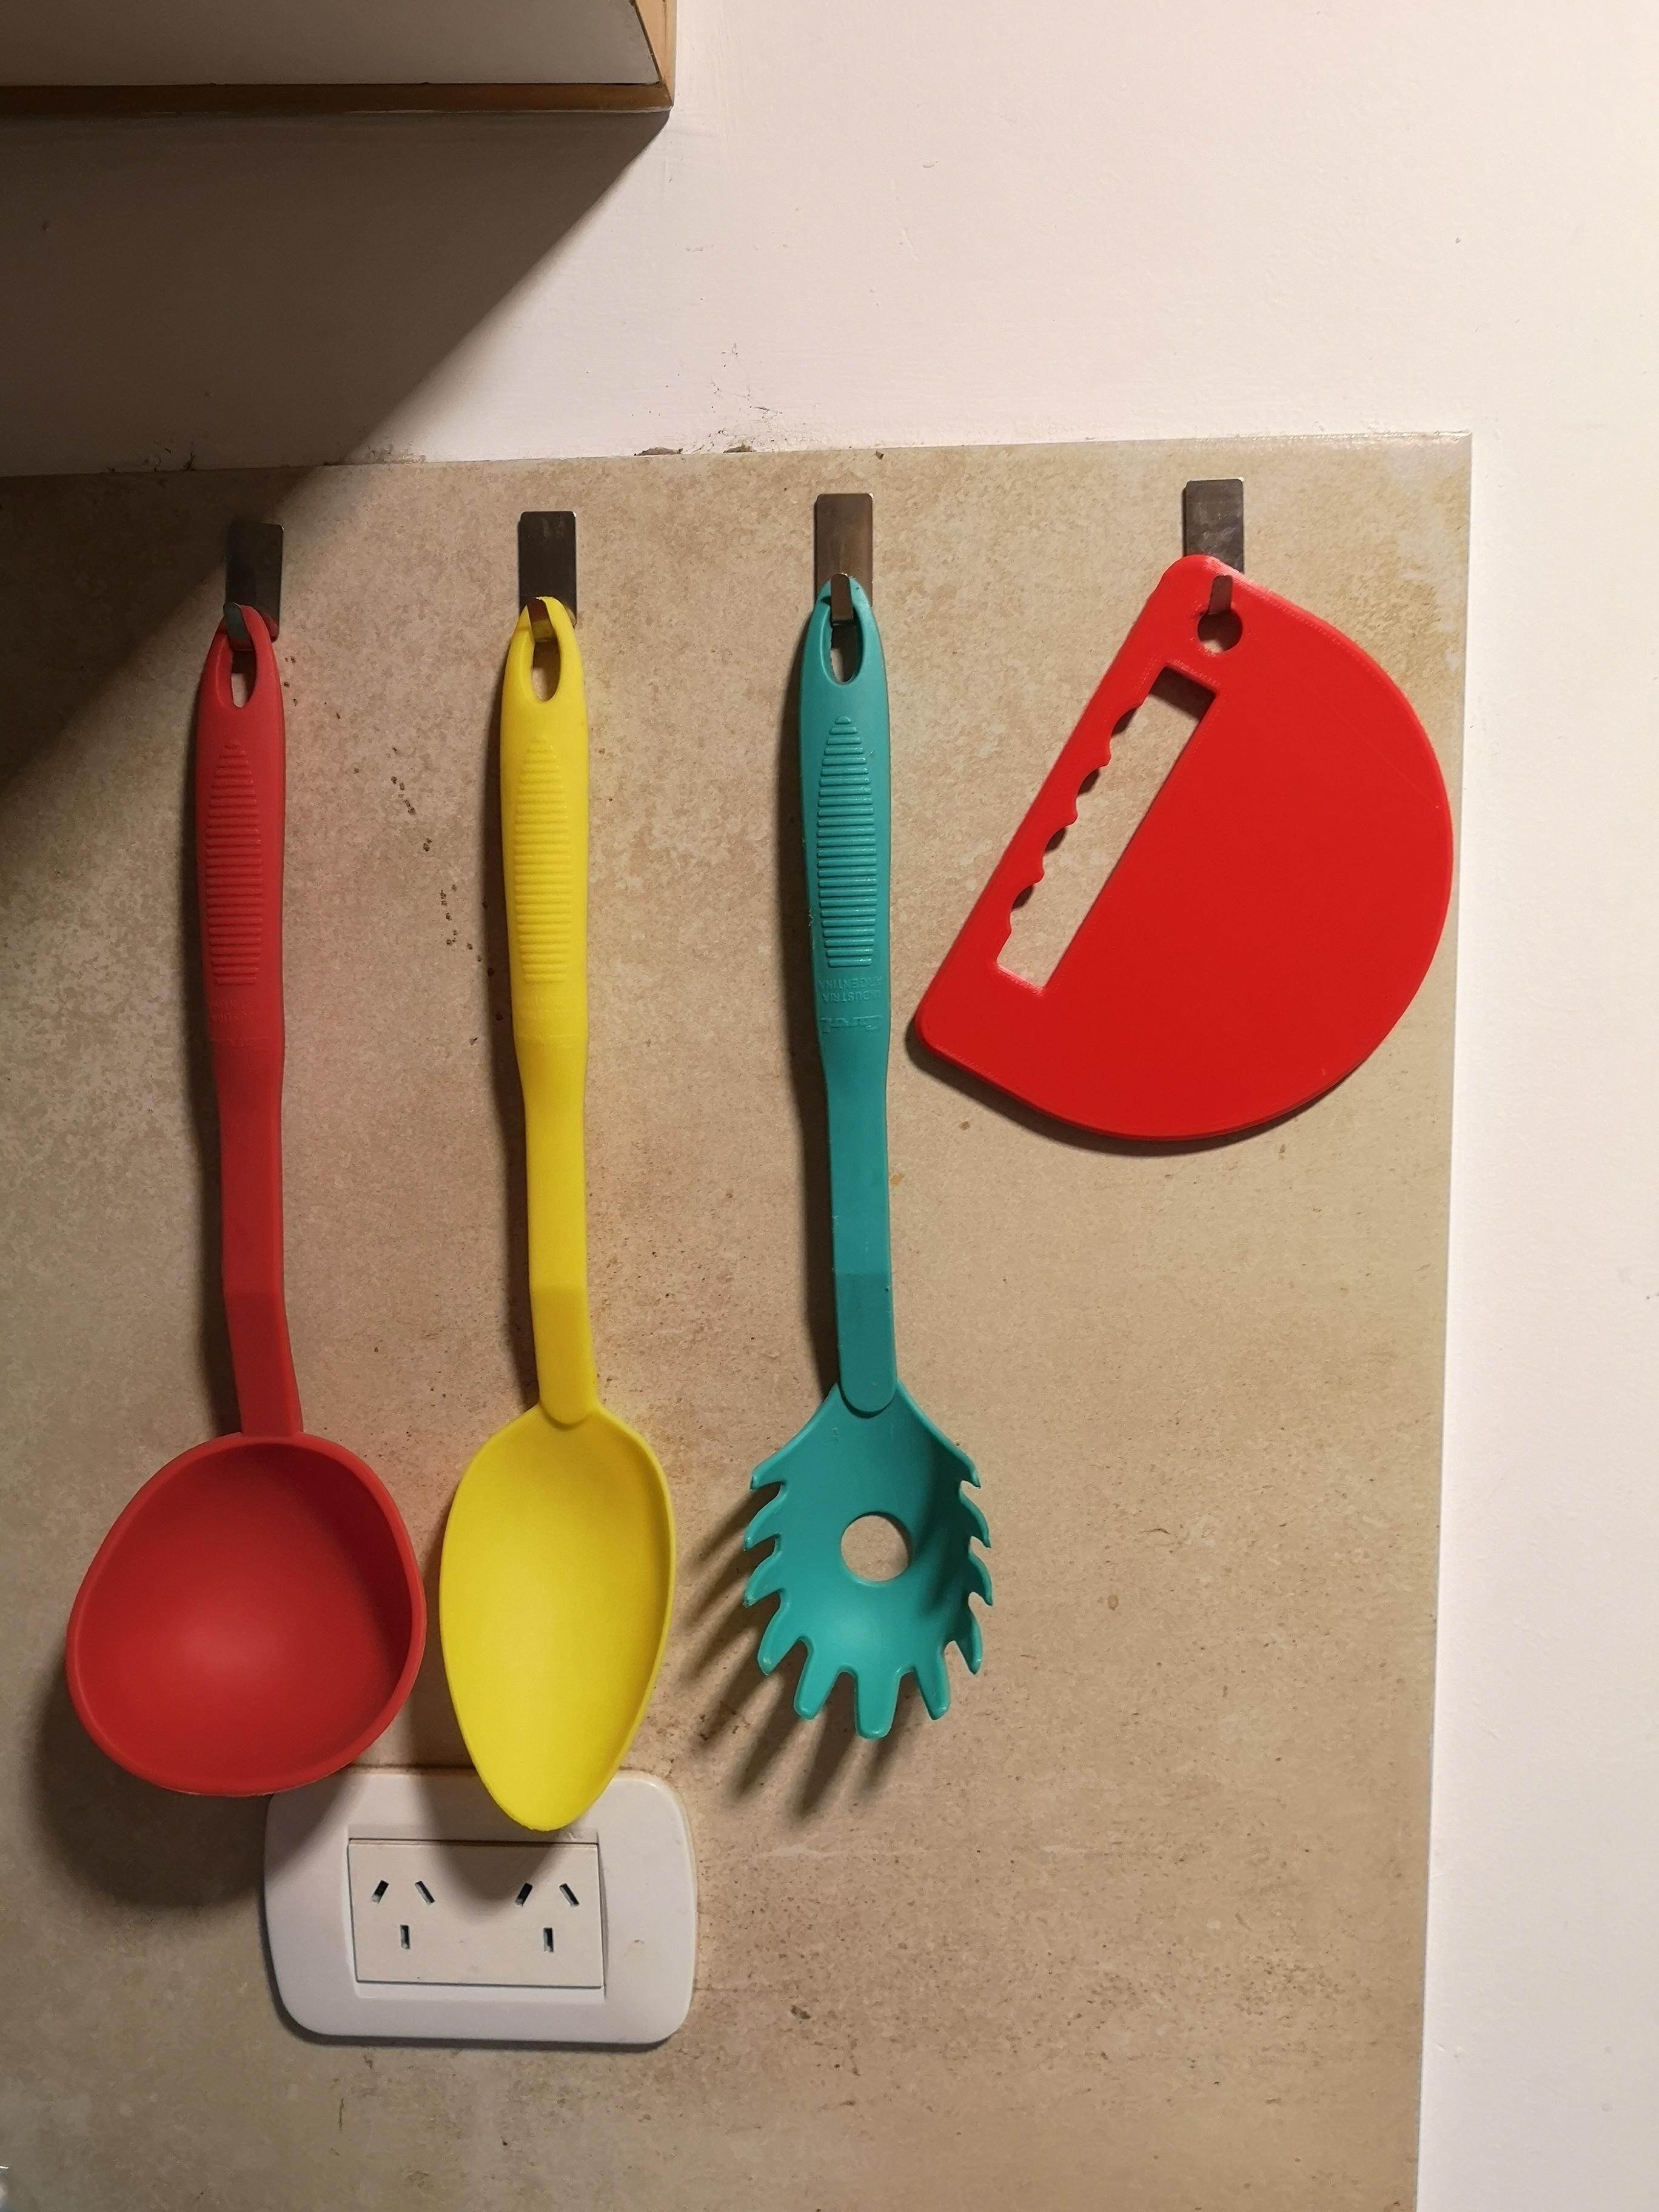 IMG_20200523_220559.jpg Download STL file Cornet Kitchen - Kitchen Spatula • 3D printing model, DimensionArg